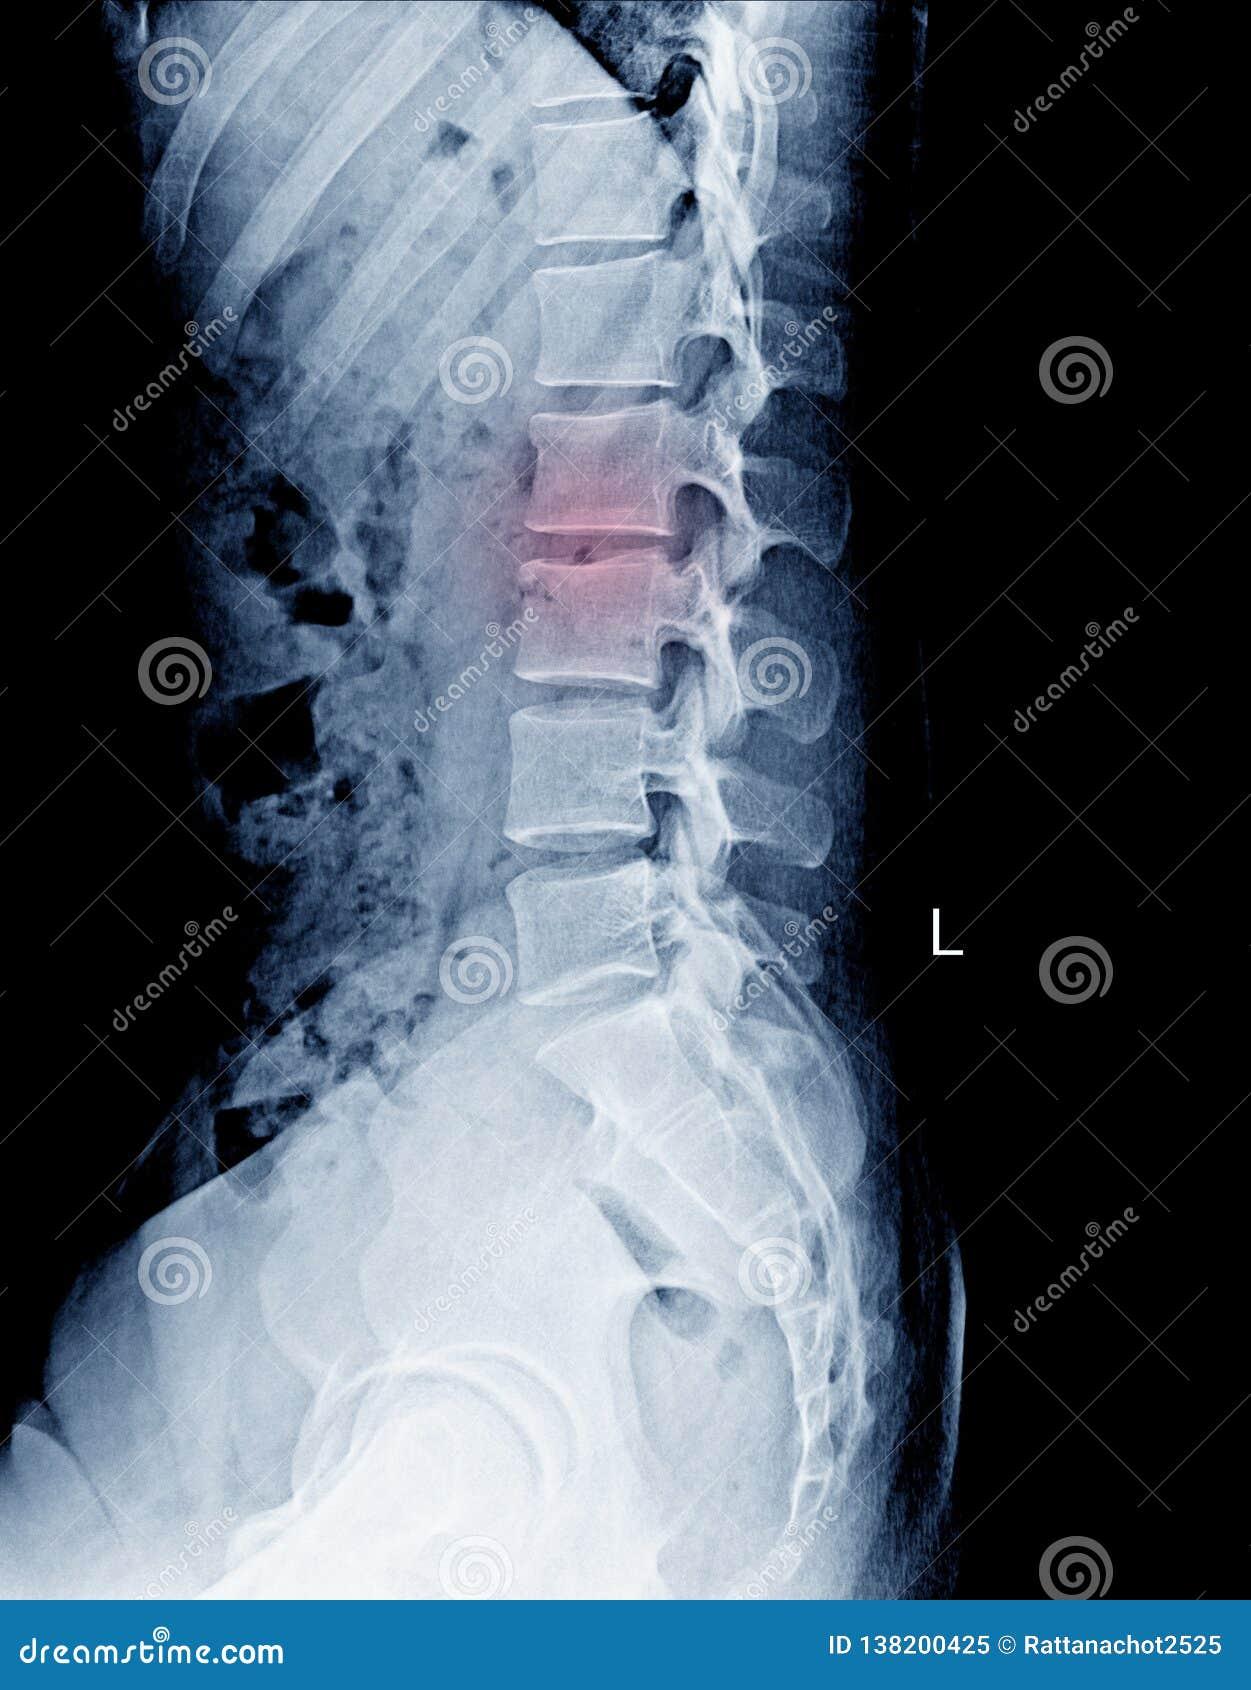 L-S SpineLumbo荐骨的AP